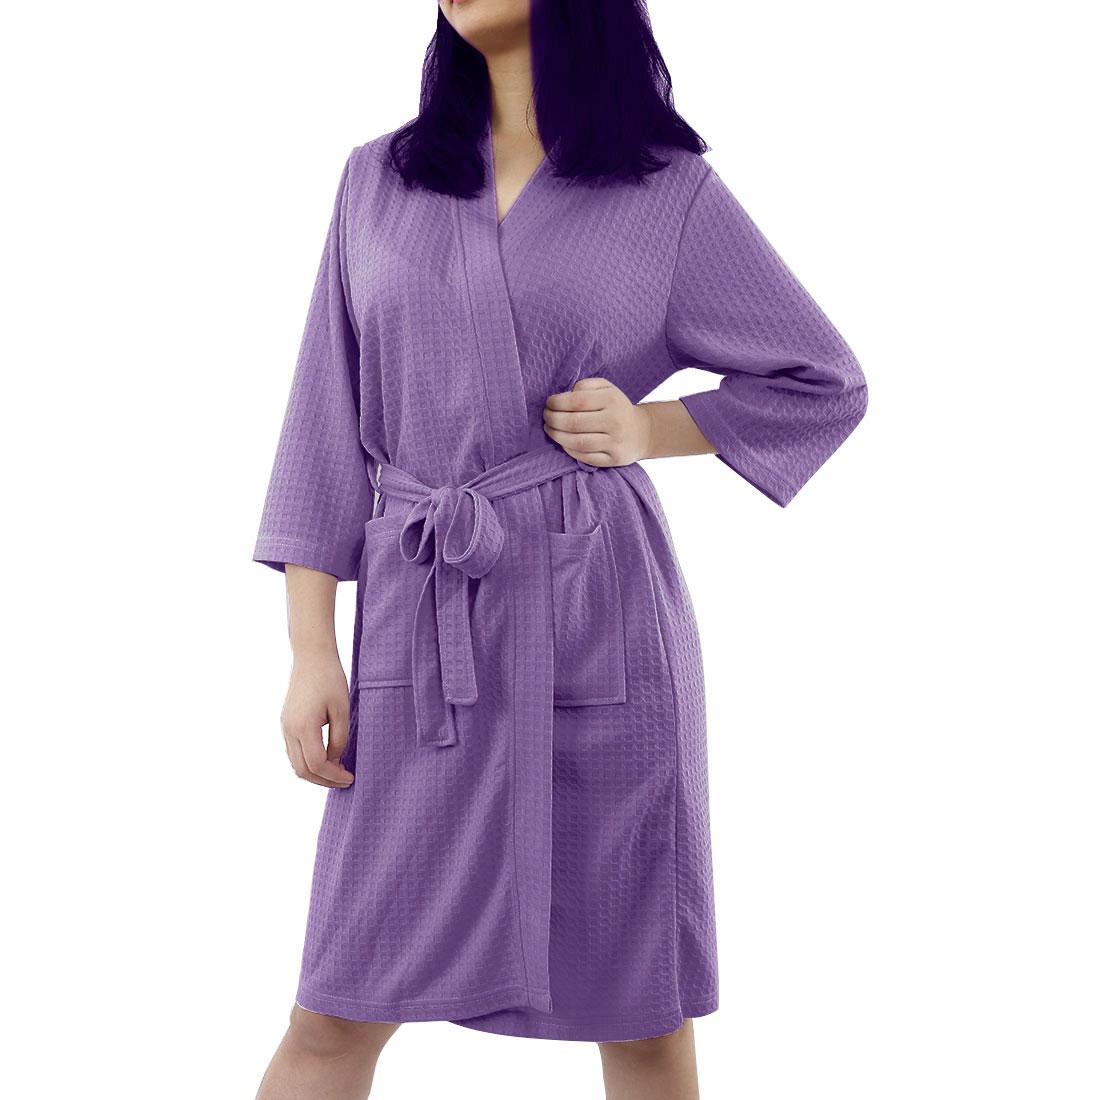 Violet Robe Black kimono robe Bamboo Robe jersey robes floral bridal robes Luxury Robe bath robe Nursing sleepwear Bamboo Knit Robe